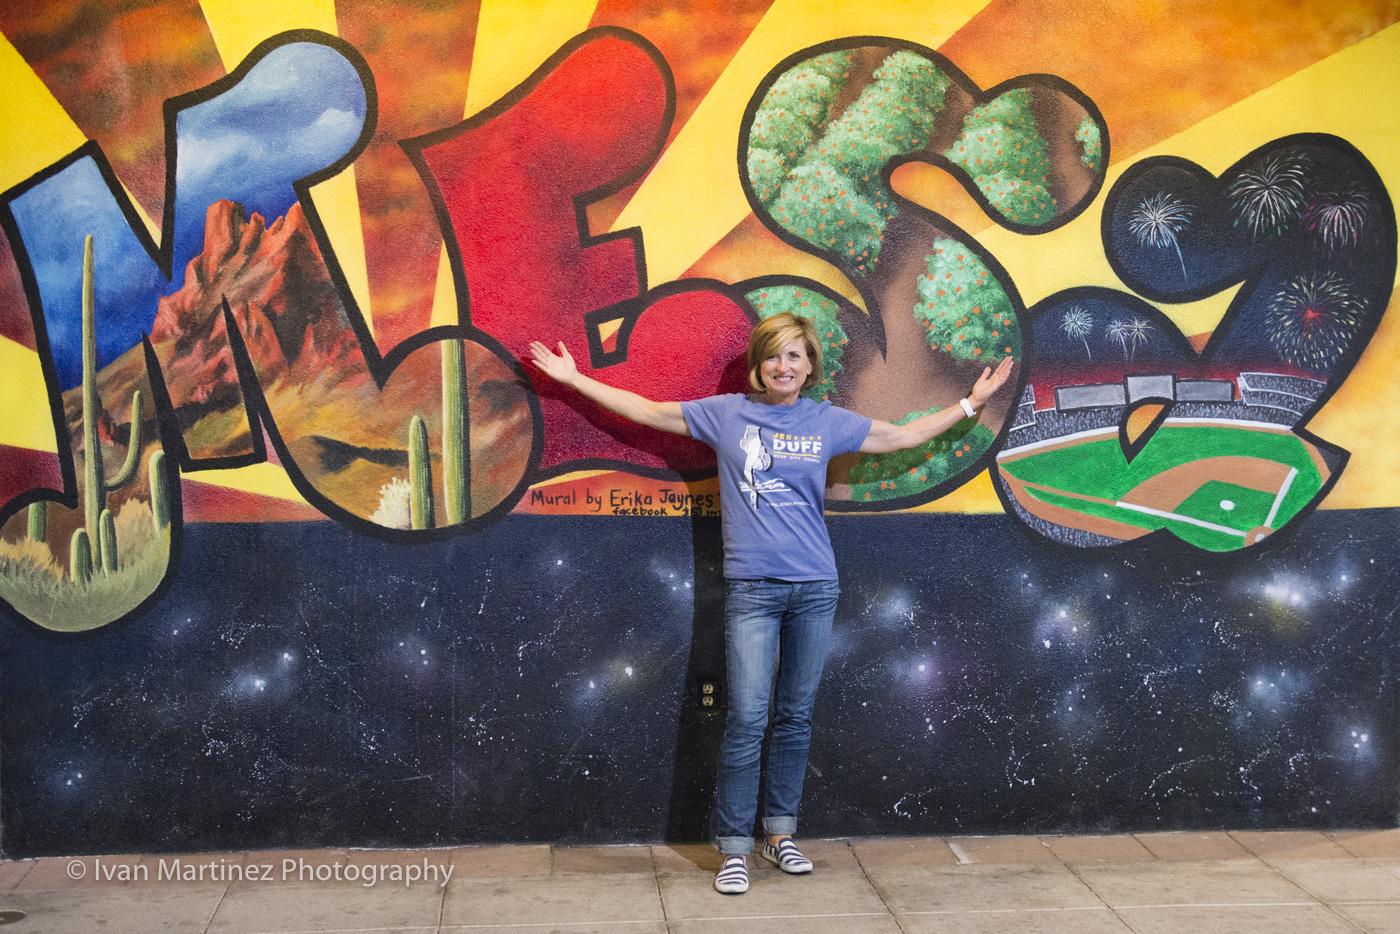 Jen Duff loves Mesa. Downtown Mural by artist, Erika Jaynes. Photo by Ivan Martinez Photography.